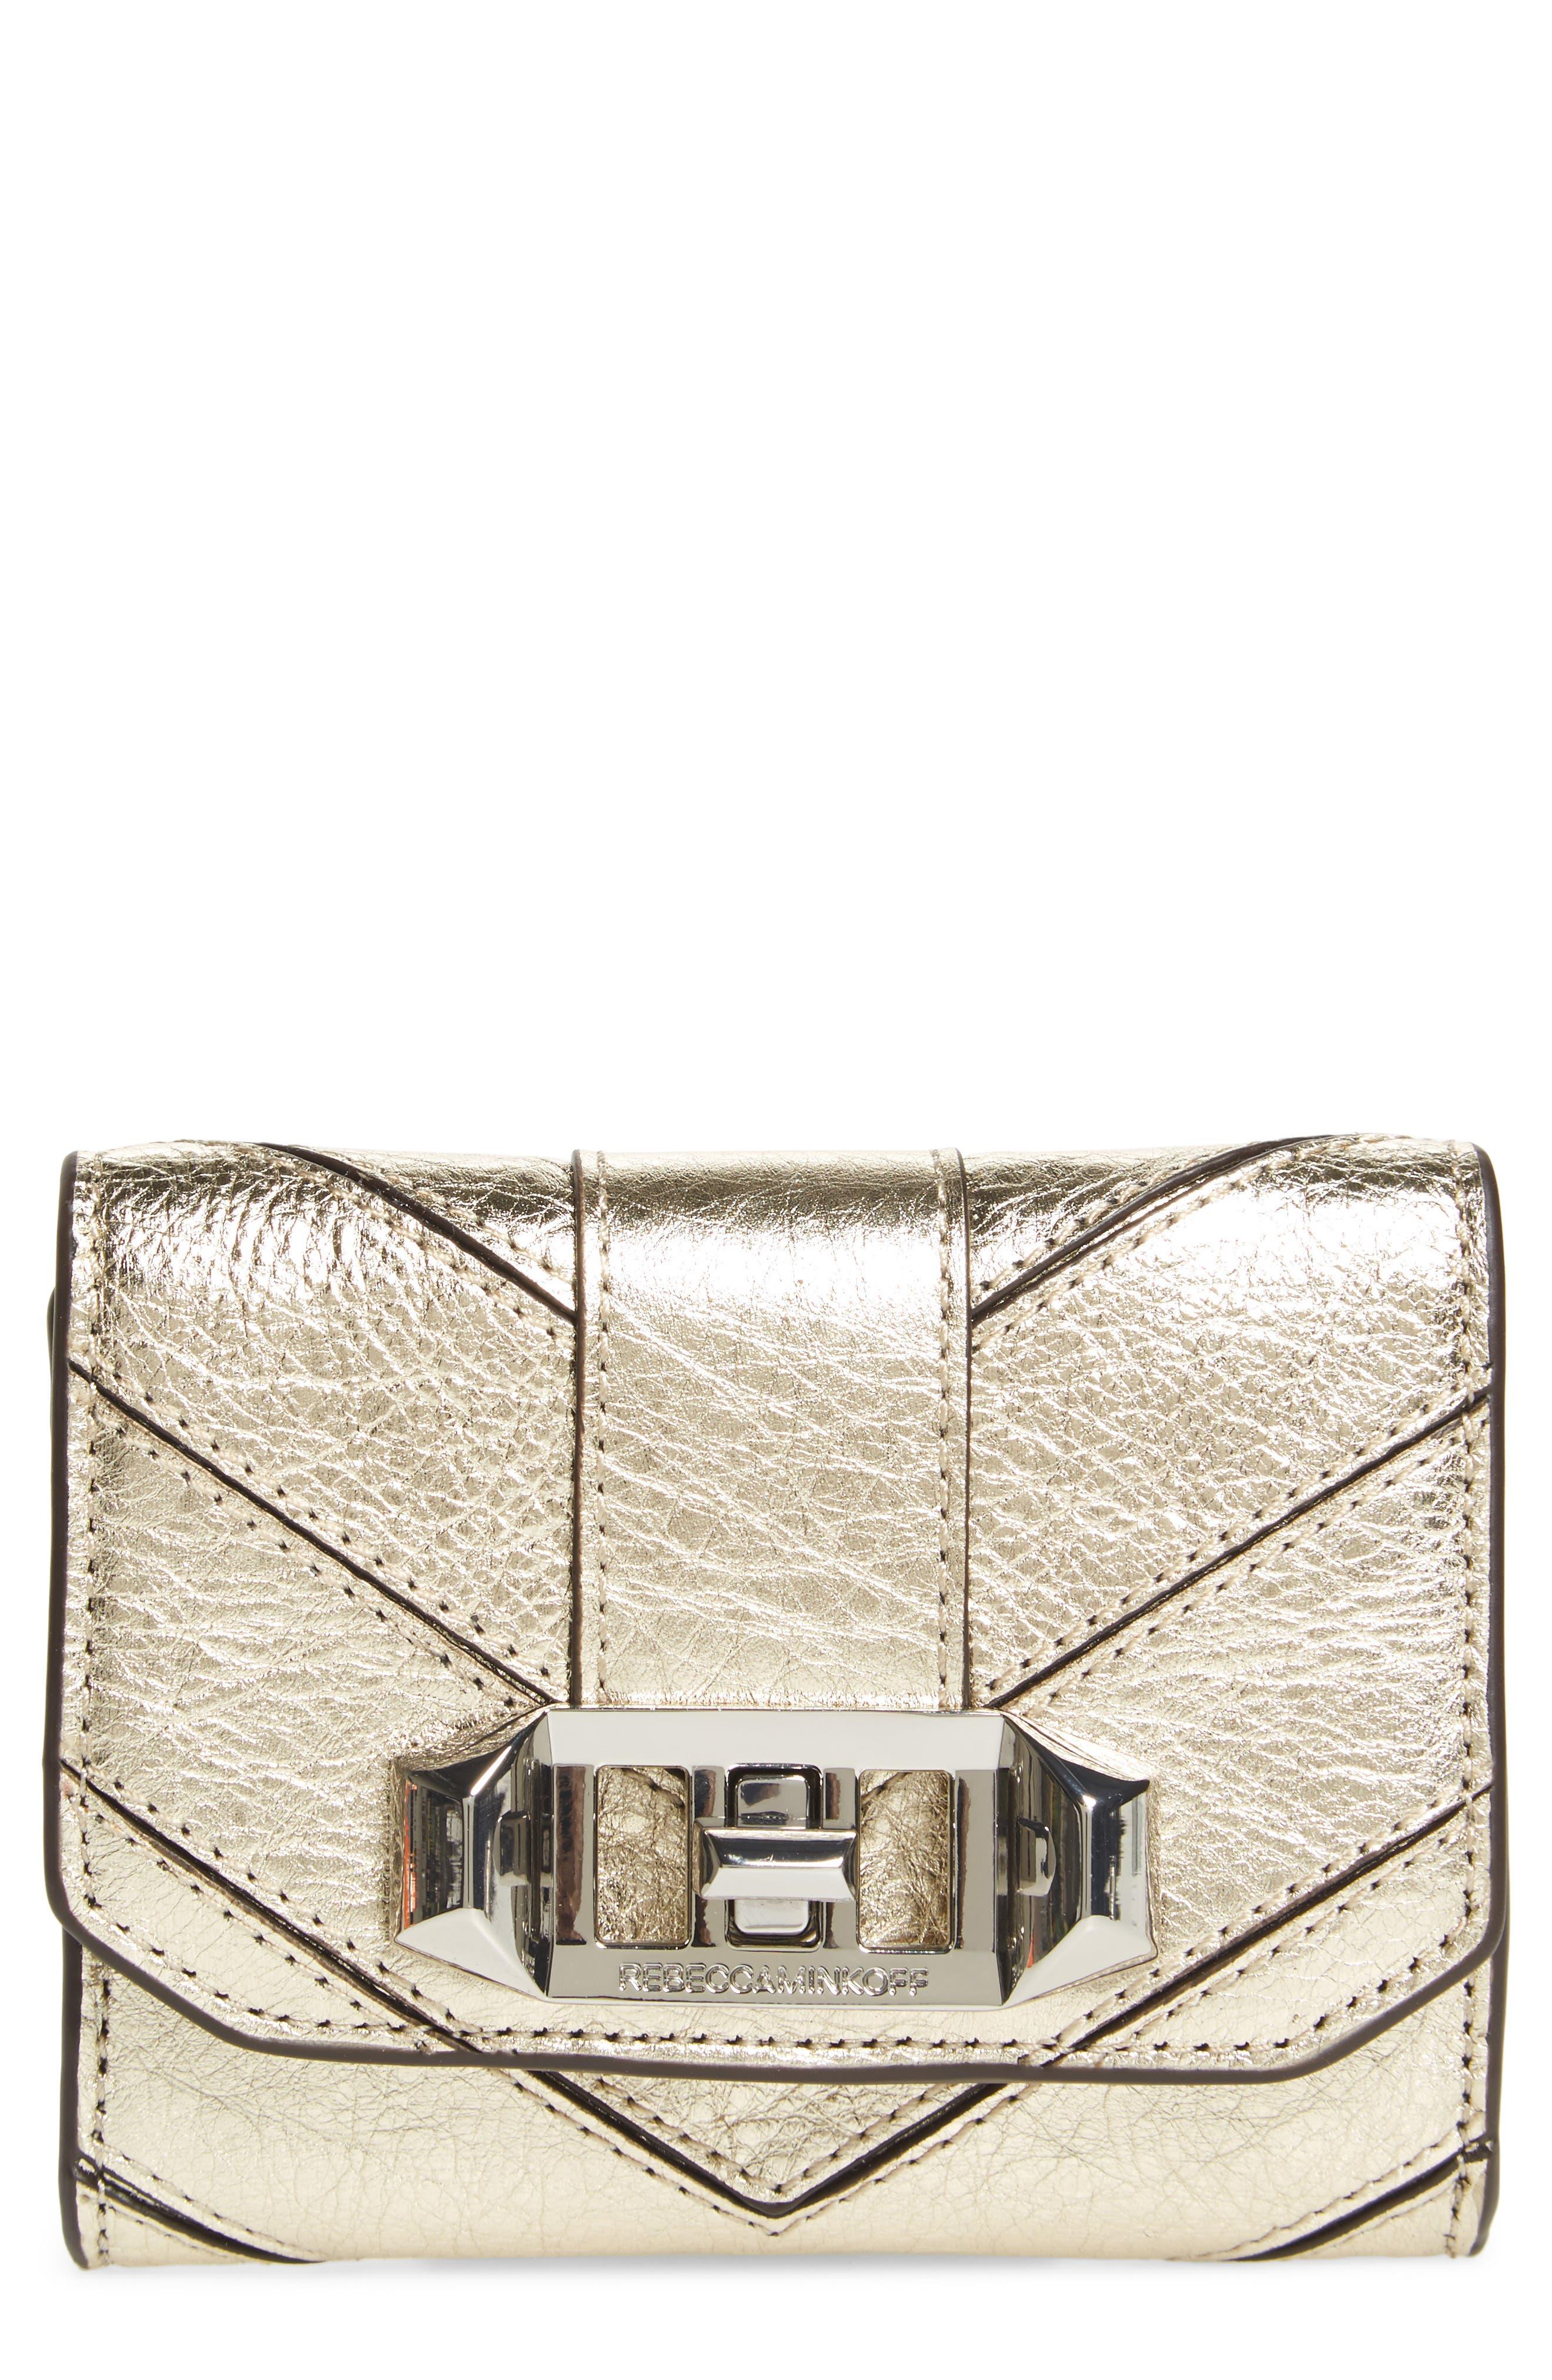 Rebecca Minkoff Love Lock Metallic Leather Wallet